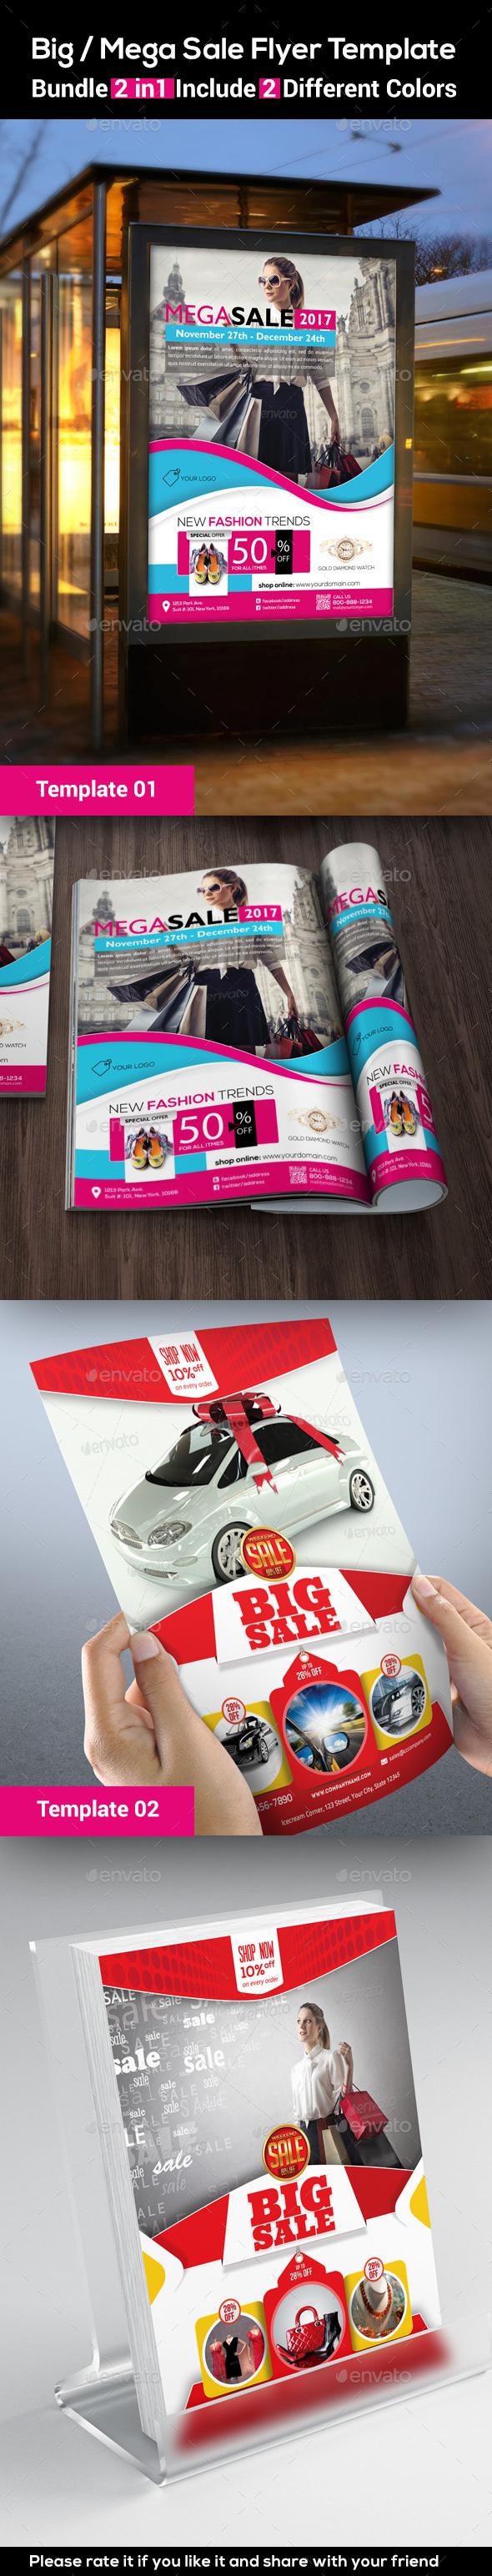 Big / Mega Sale Flyer Template (Bundle 2 in 1) - Flyers Print Templates